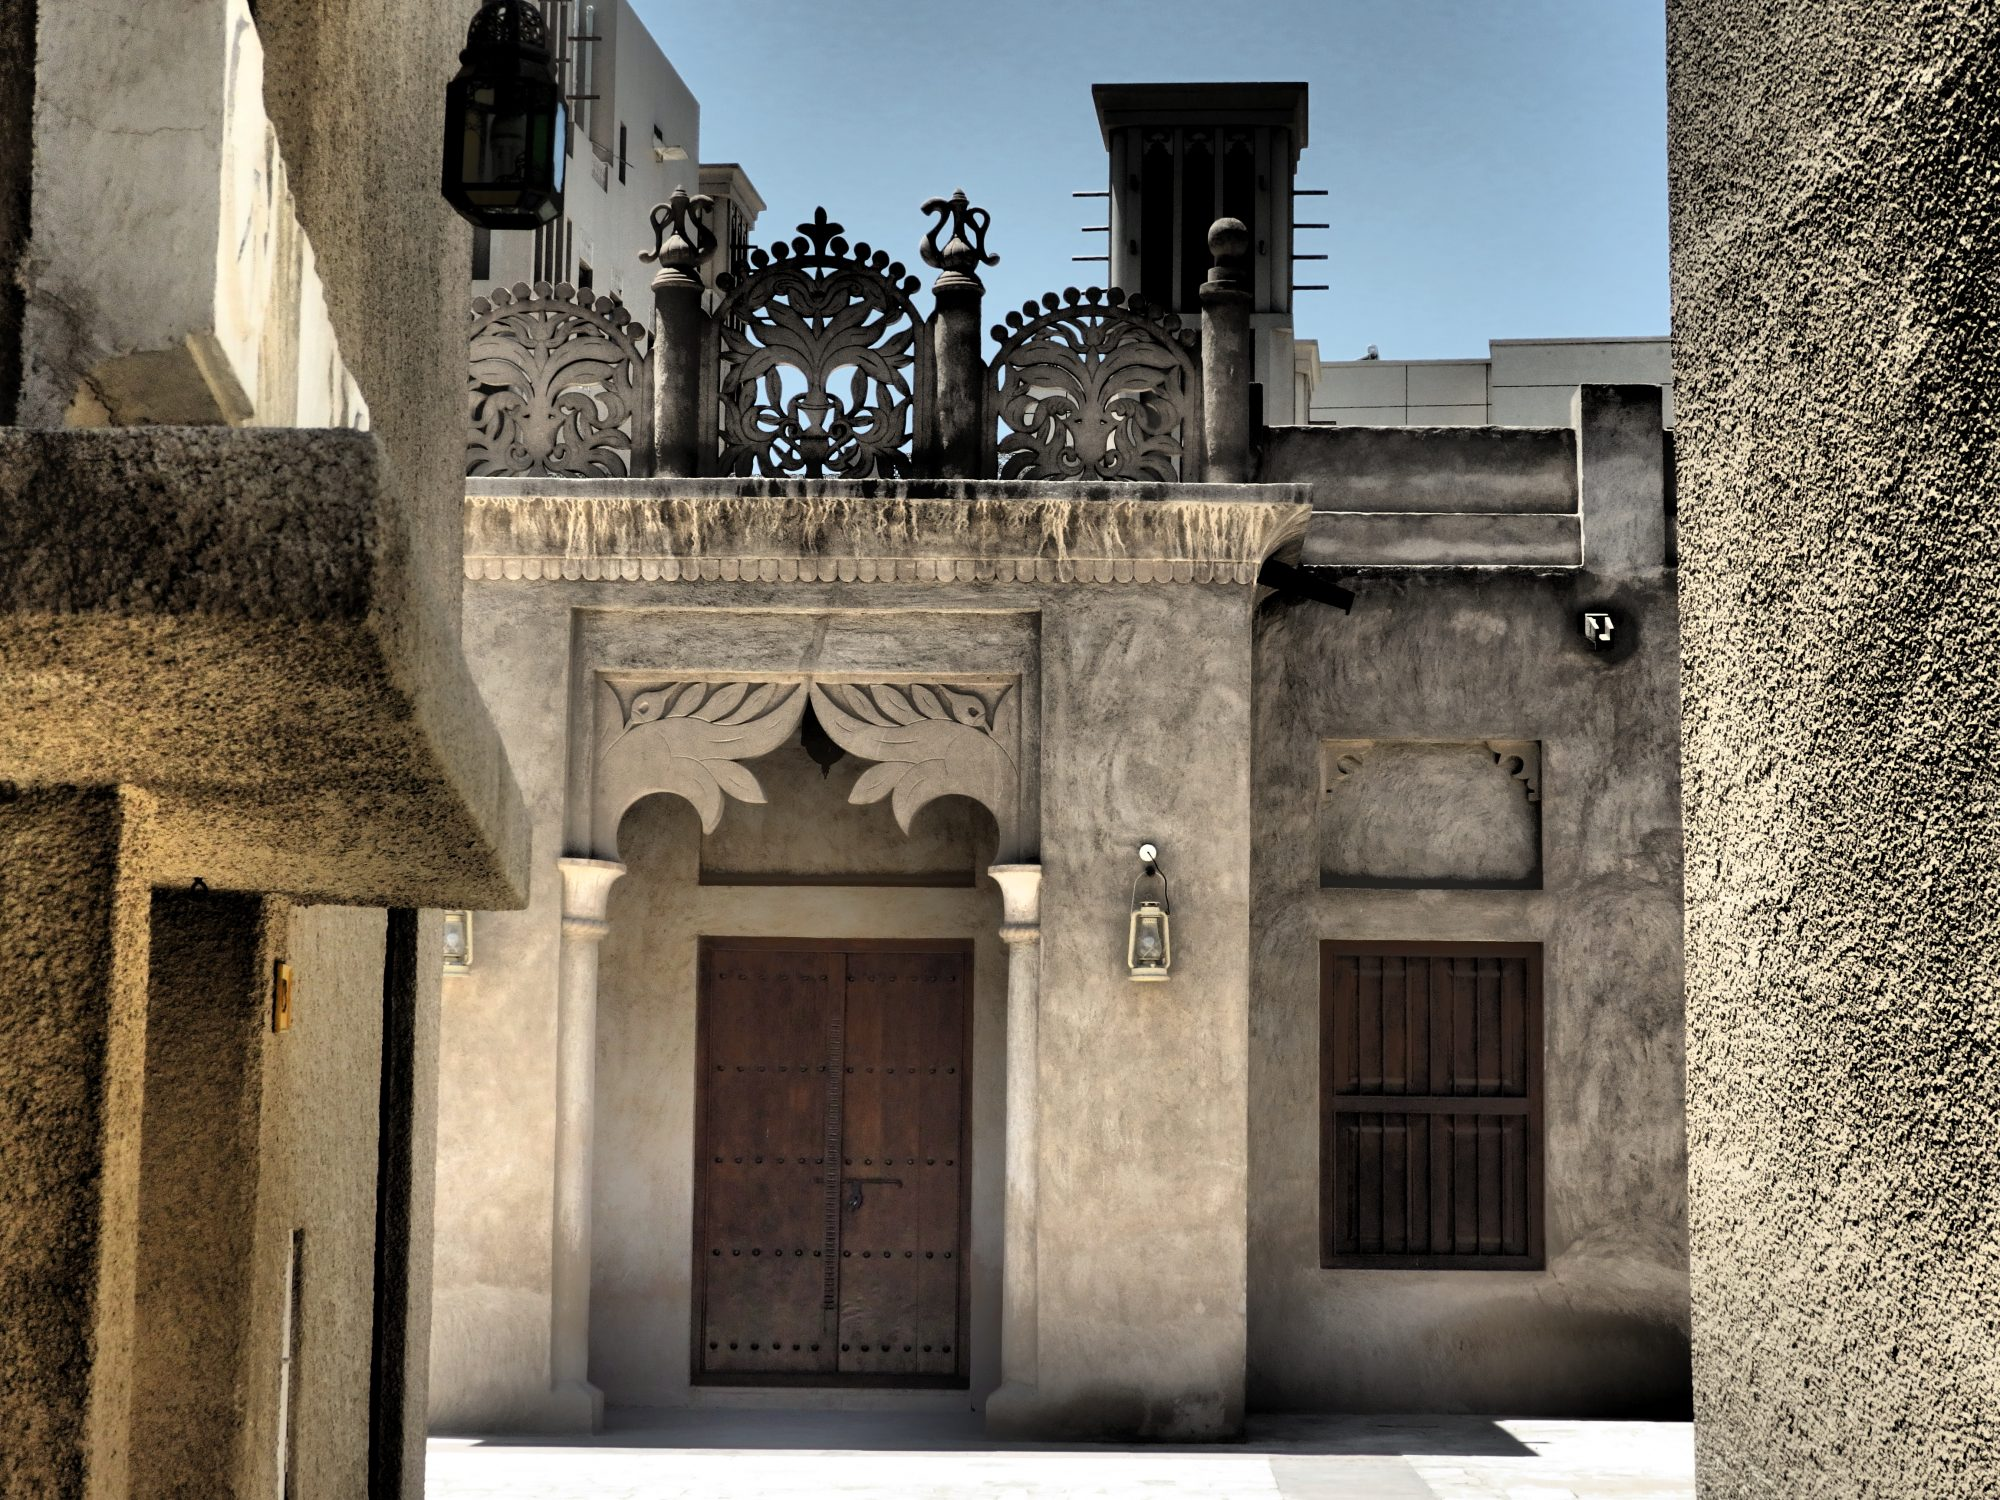 a streetscape in Old Dubai